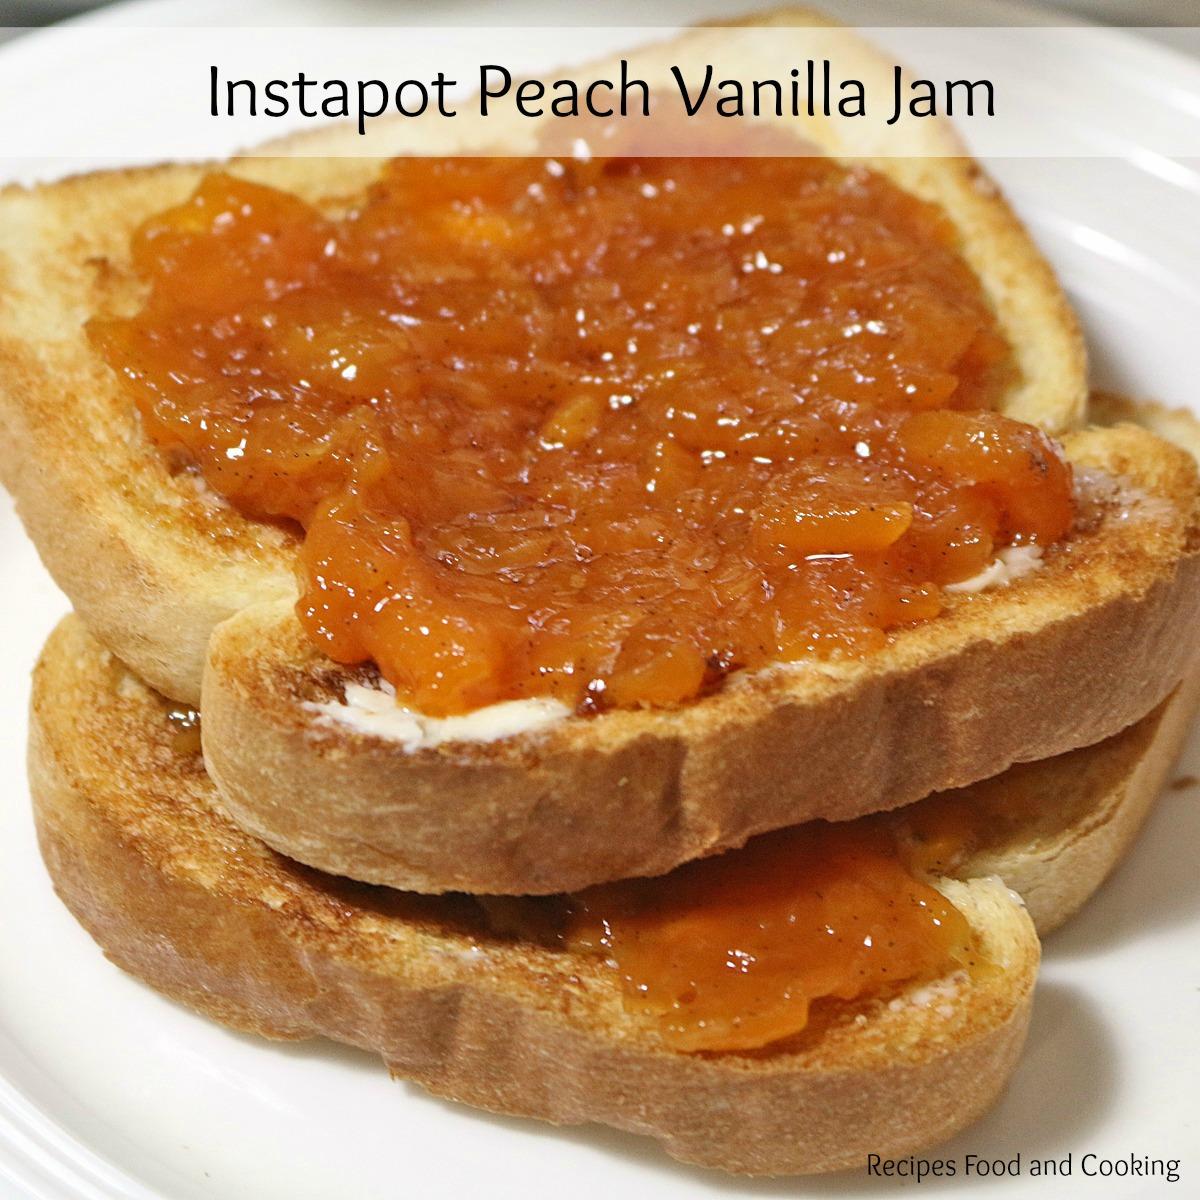 Instapot Peach Vanilla Jam